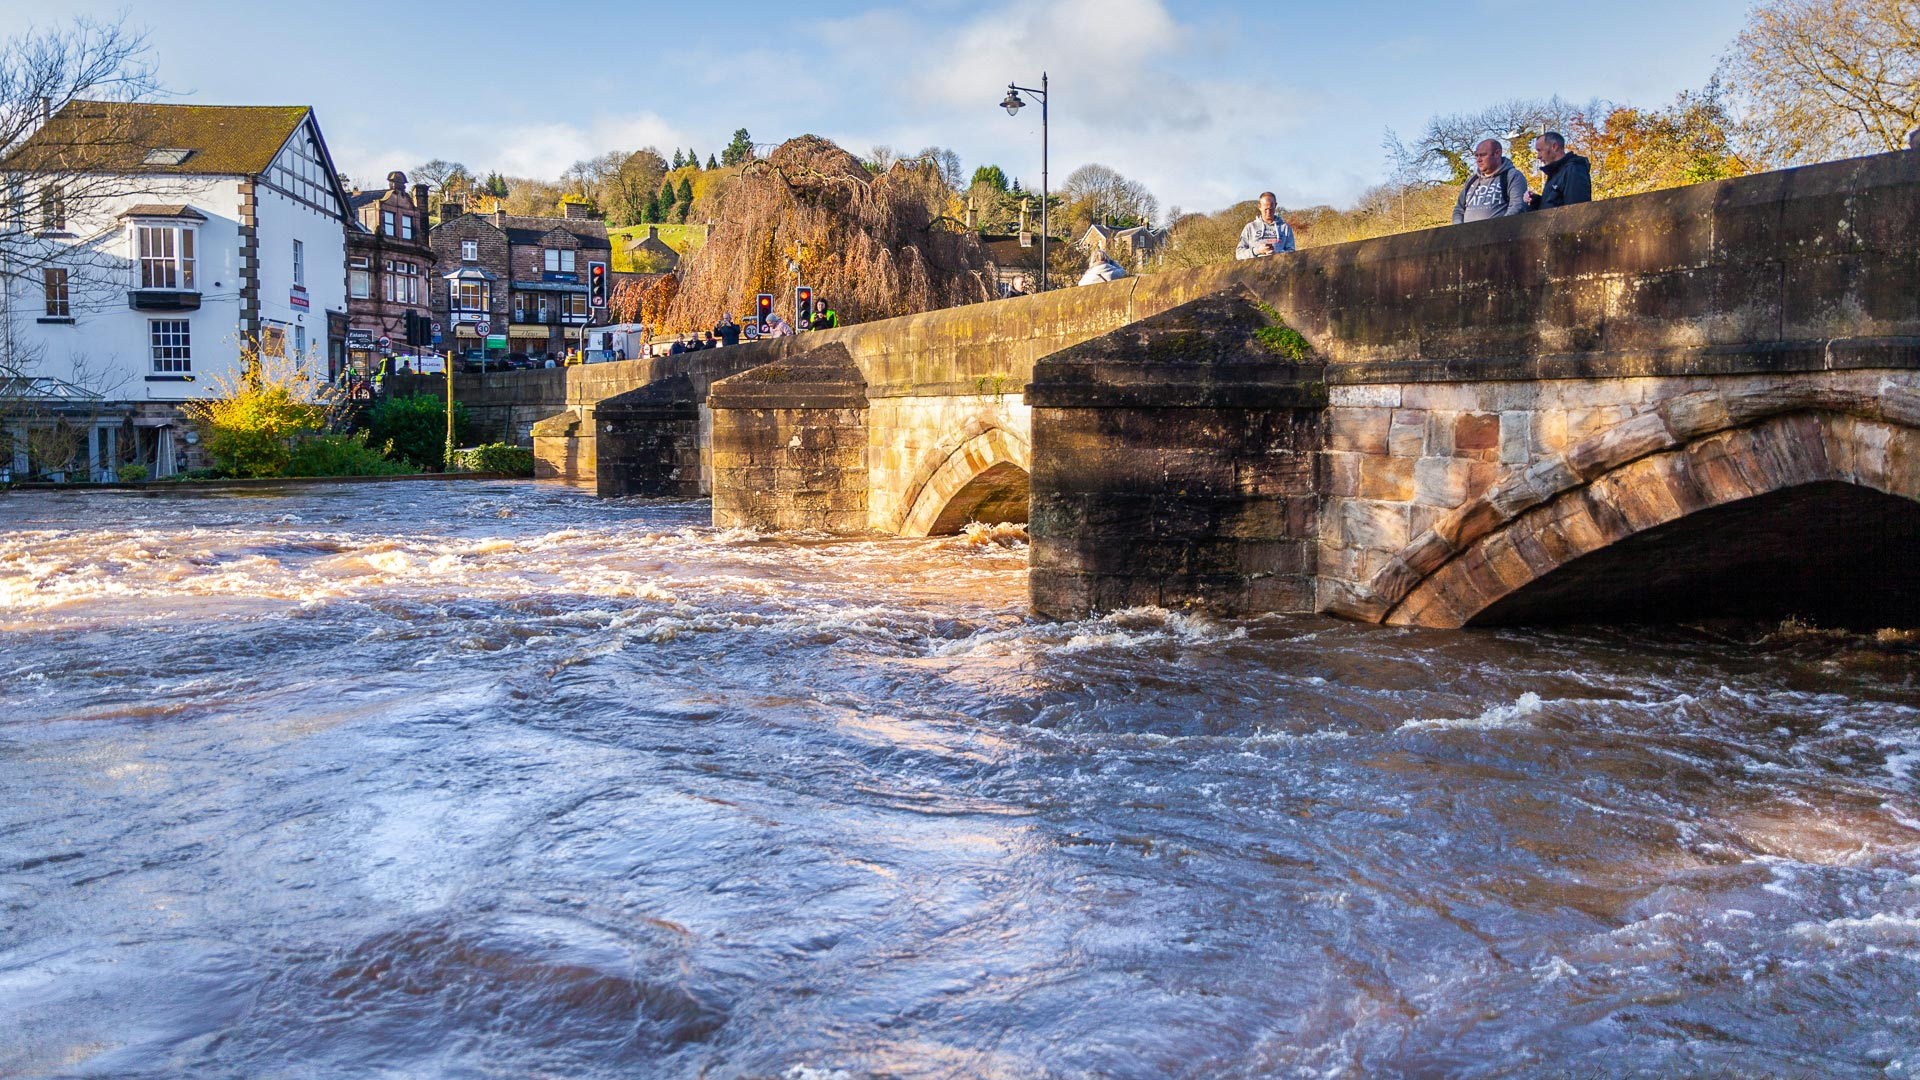 JonathanChristianPhotography_Matlock-Derbyshire-Flooding-1006